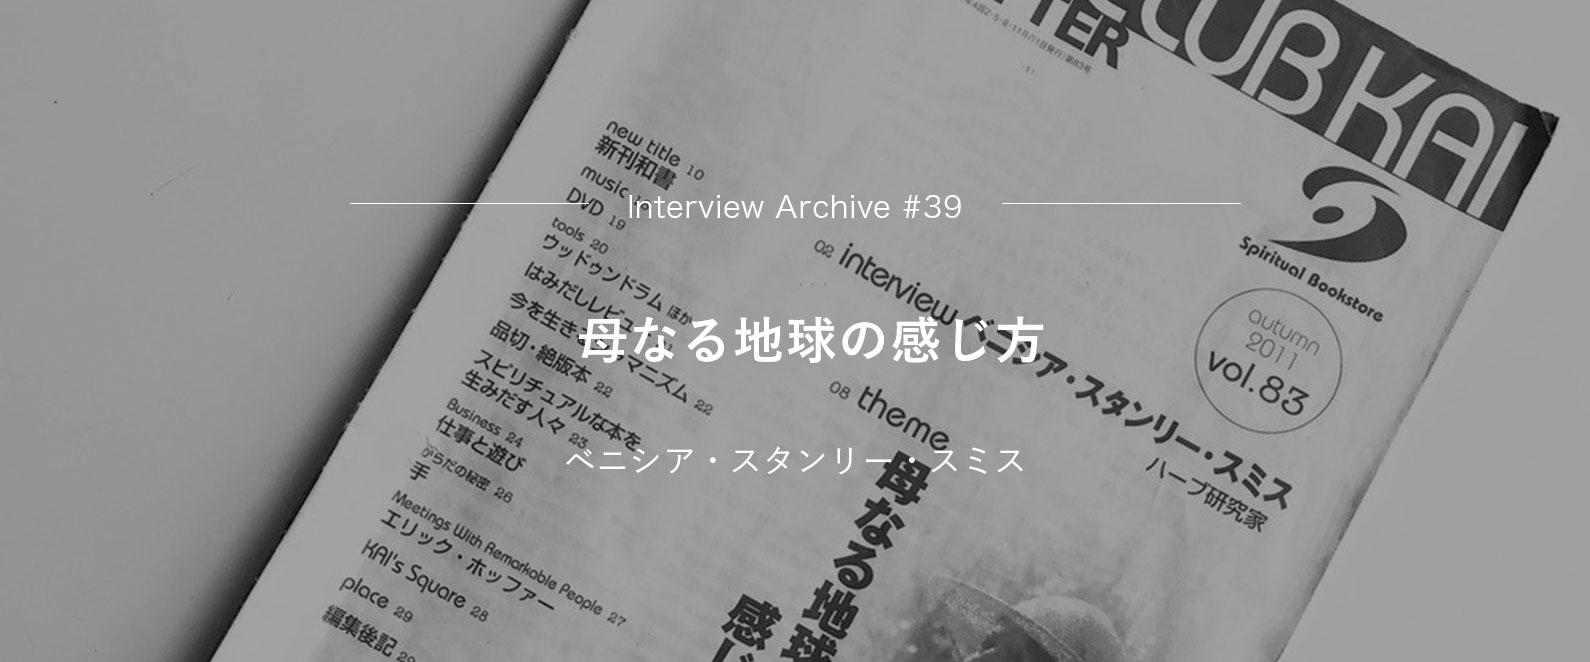 Book Club KAI プリペイド・ギフトカード発売のお知らせ。